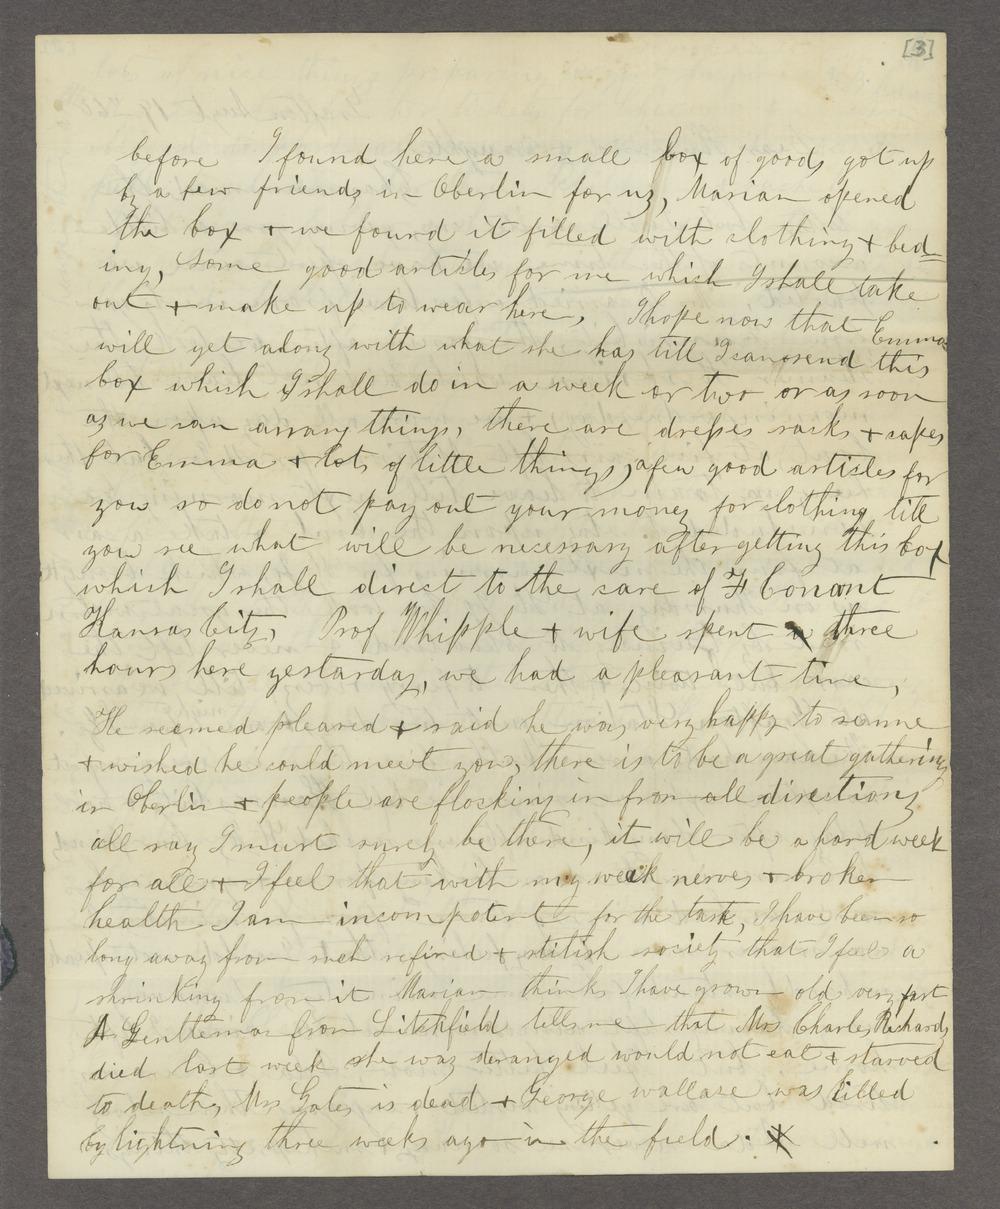 Correspondence between Samuel Lyle Adair, Florella Brown Adair, and their children - 4